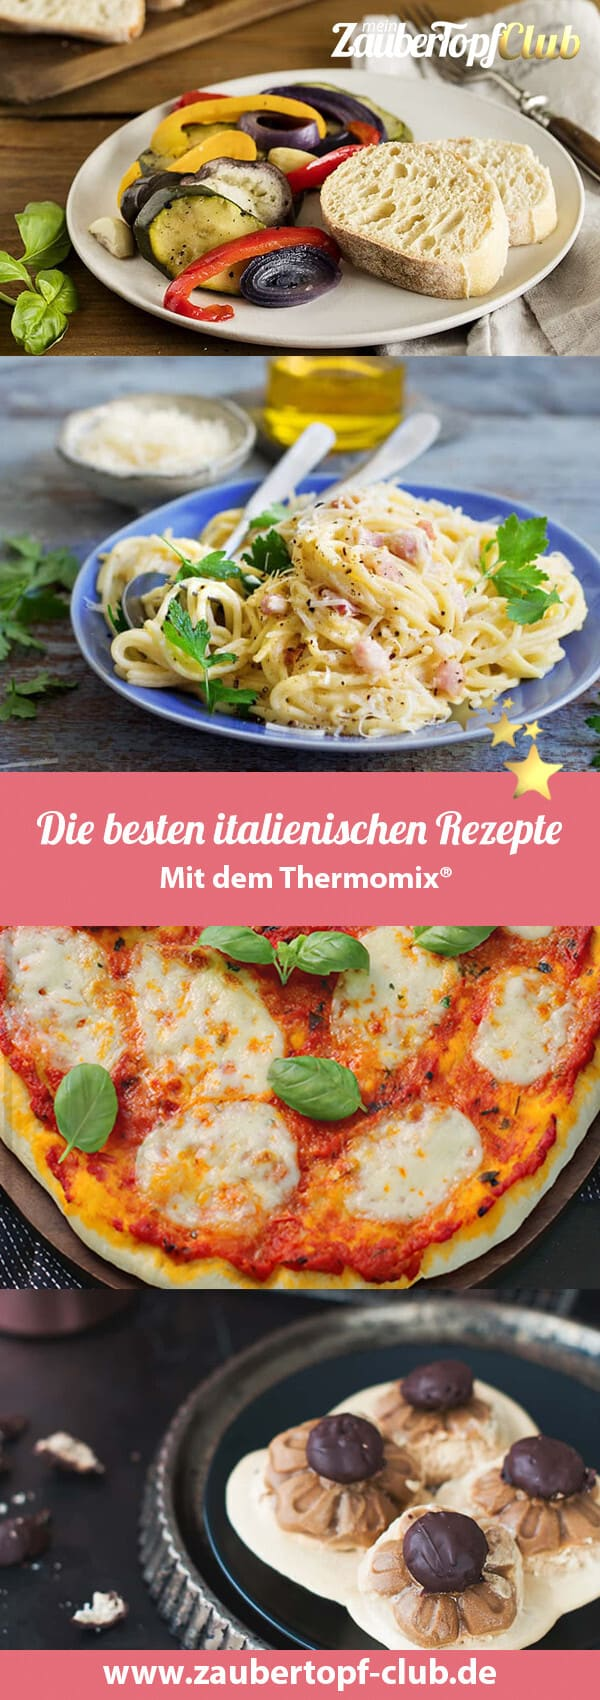 Italienische Rezepte – Fotos: Katharina Küllmer, Alexandra Panella, Ira Leoni